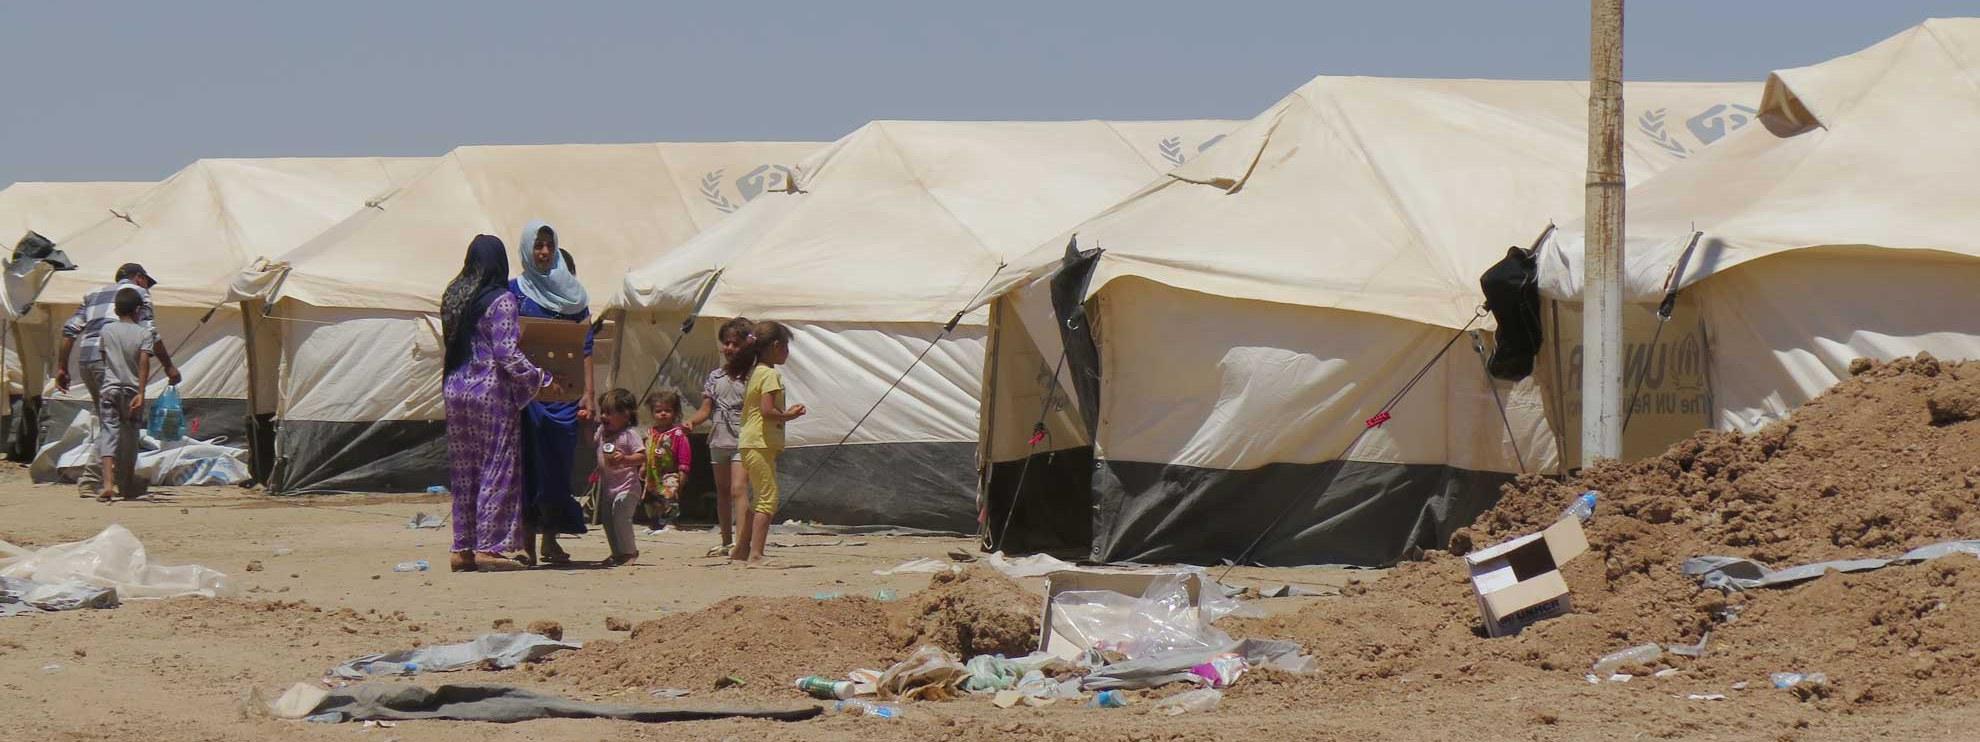 Camp de refugiés à Kalak, Irak. © Amnesty International